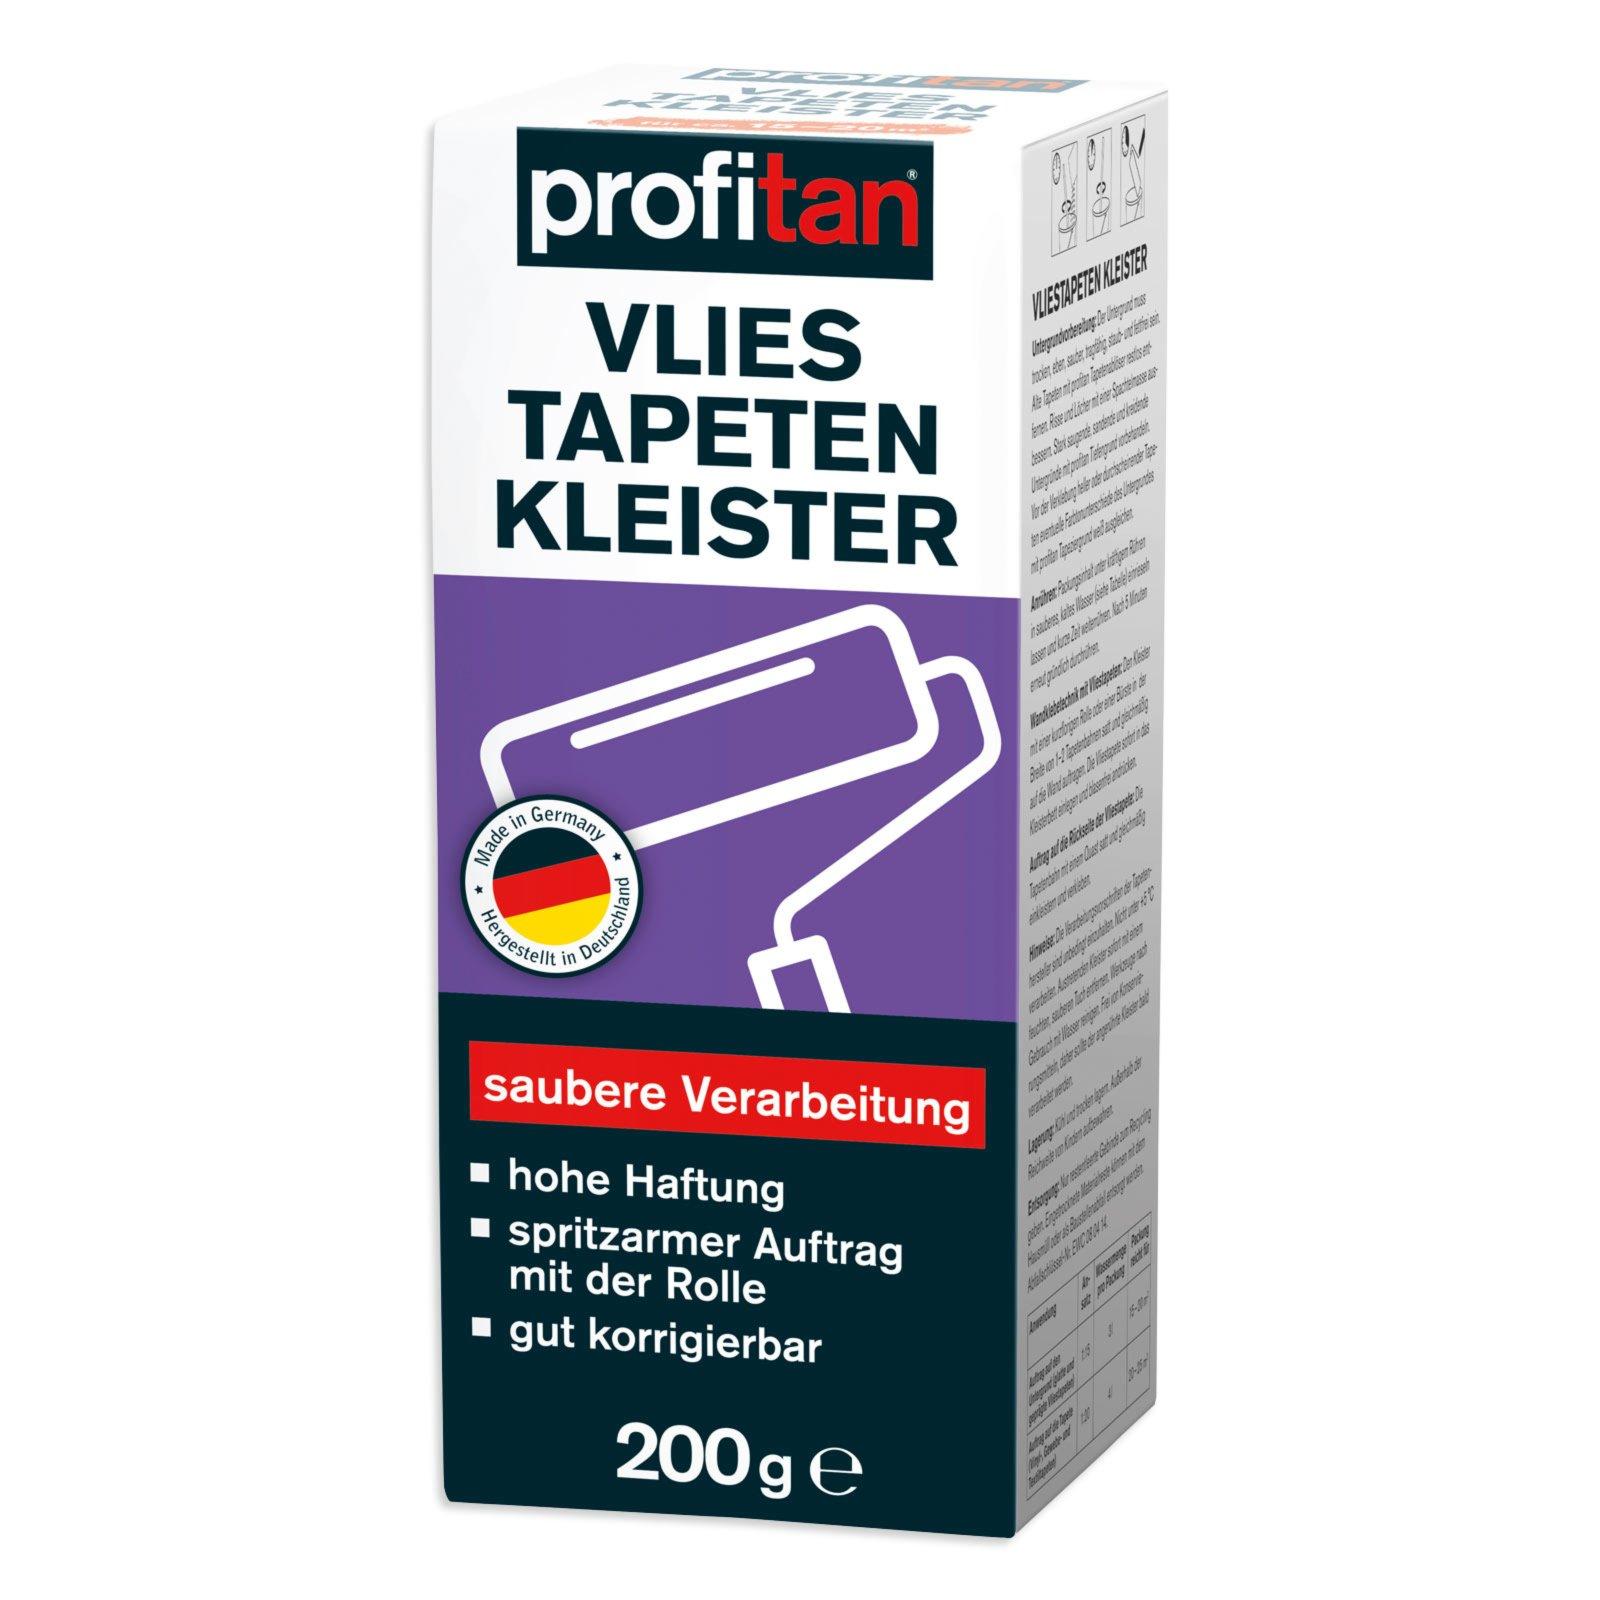 profitan Vliestapeten-Kleister - 200 g - spritzarm